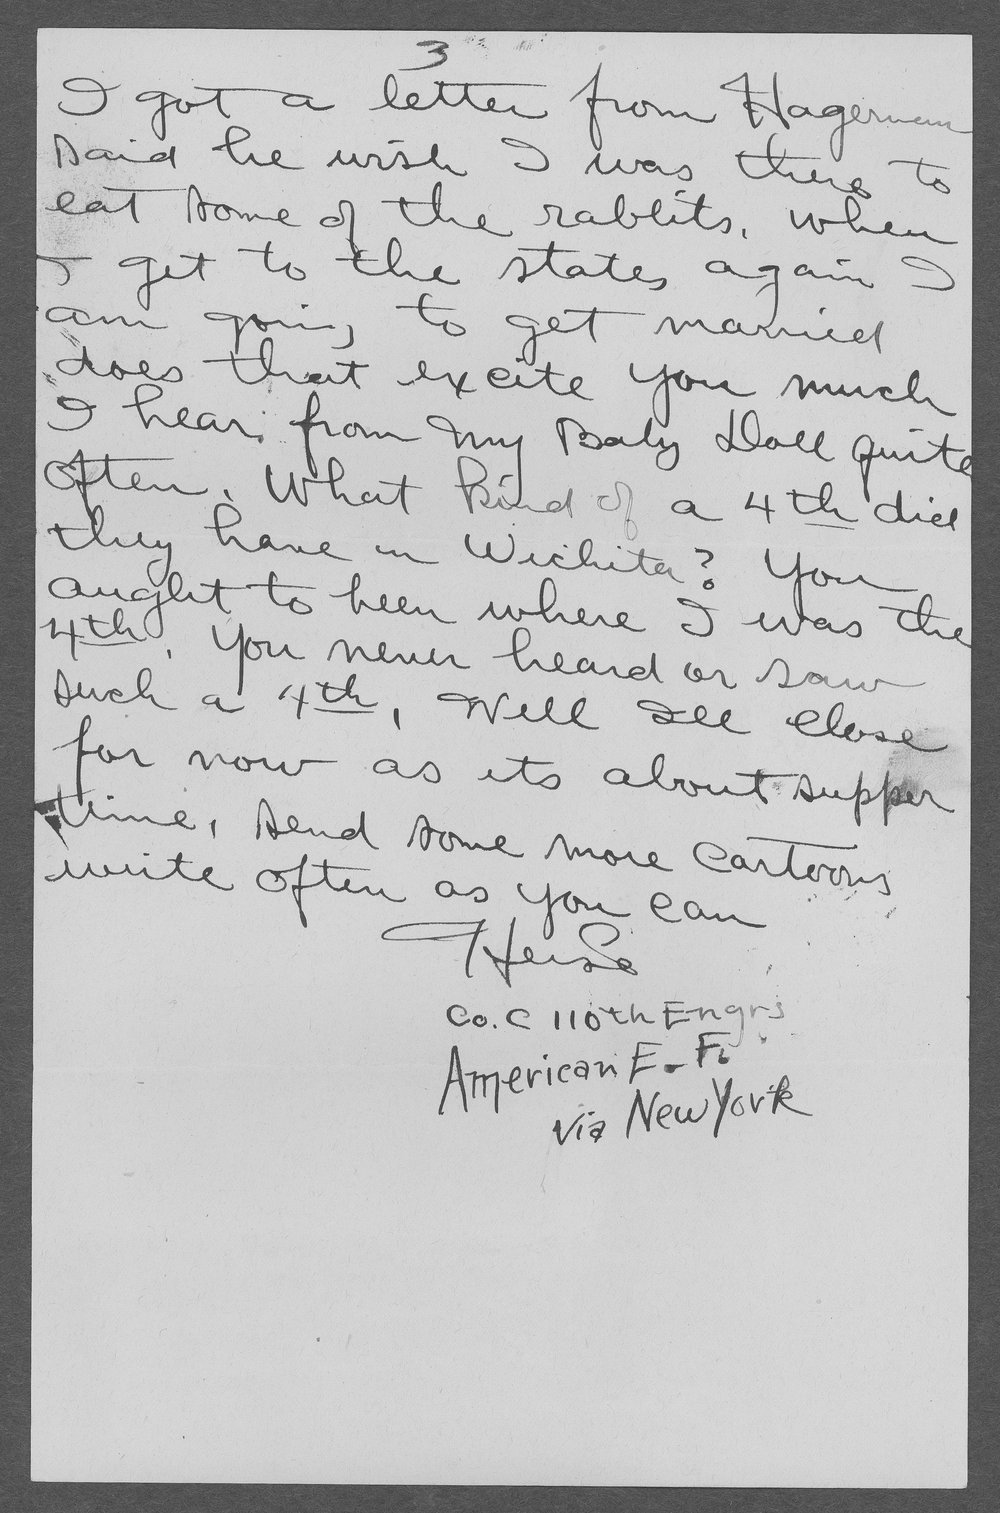 Heise Henry Sebree, World War I soldier - 12